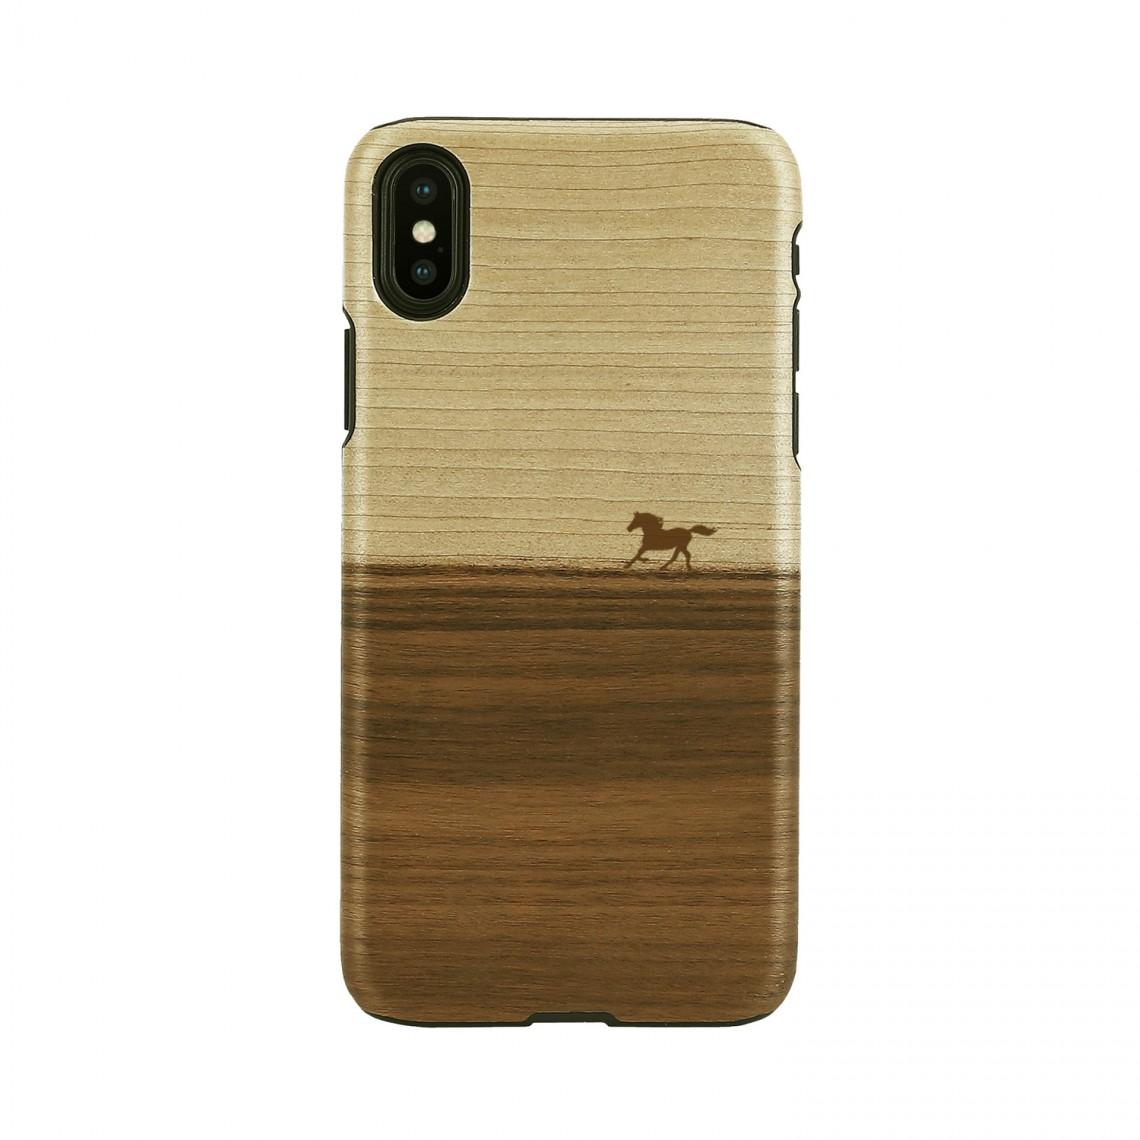 iPhone XS Max ケース 天然木 Man&Wood Mustang(マンアンドウッド マスタング)